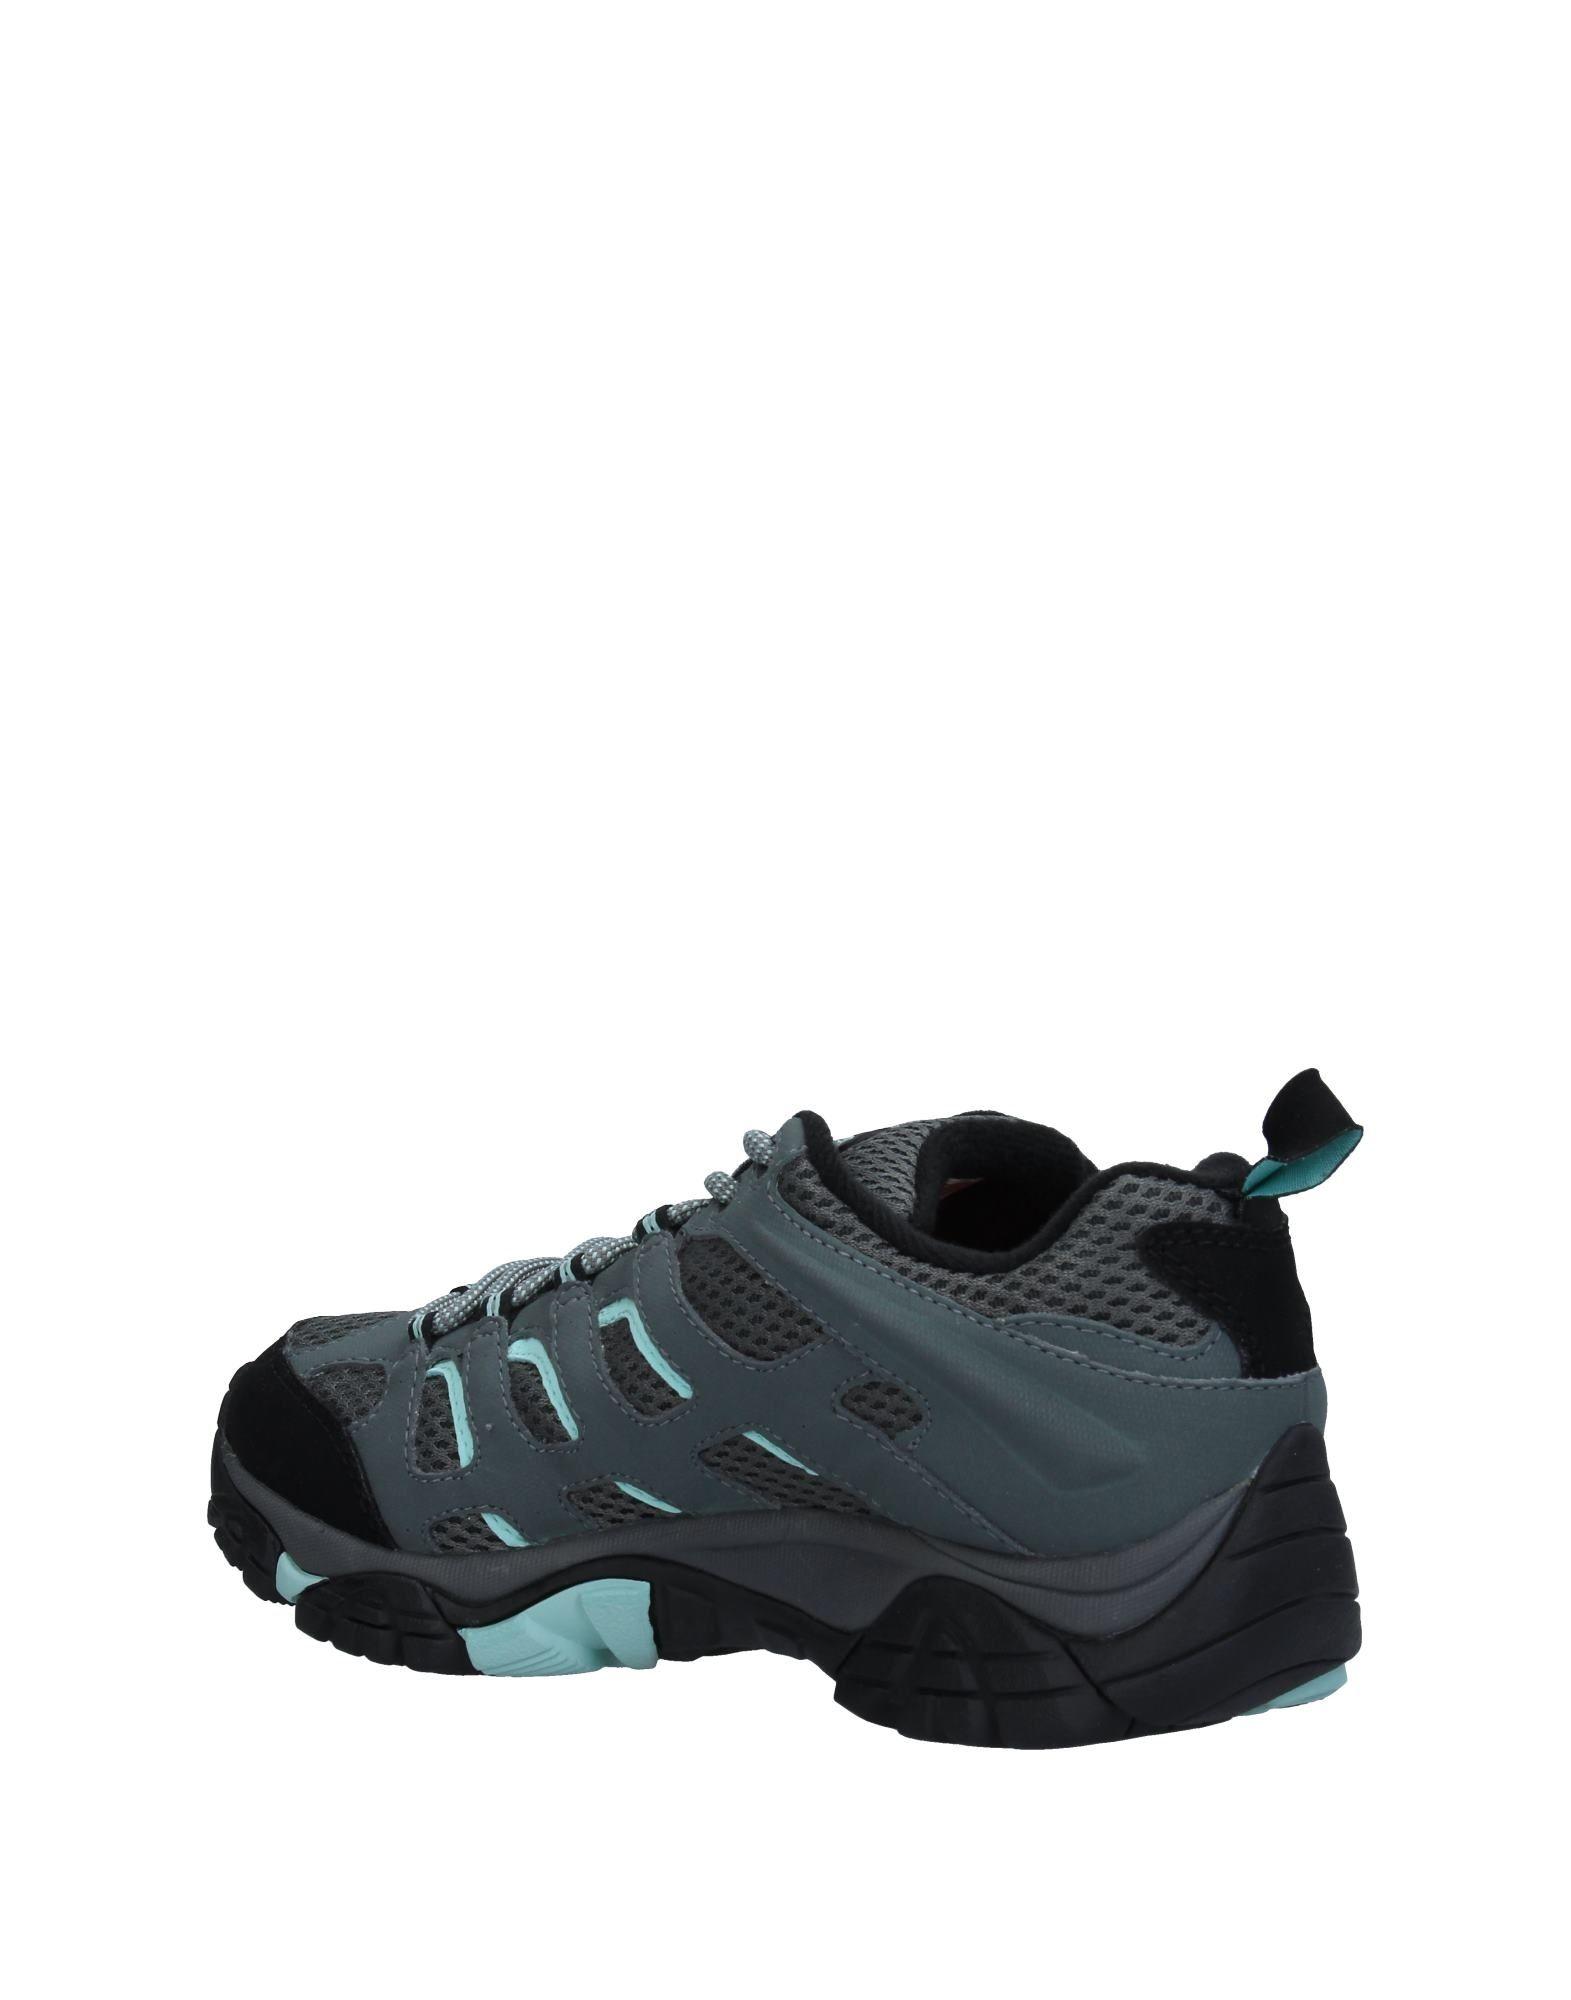 Merrell Sneakers Sneakers Merrell Damen  11377070QI 5af03a